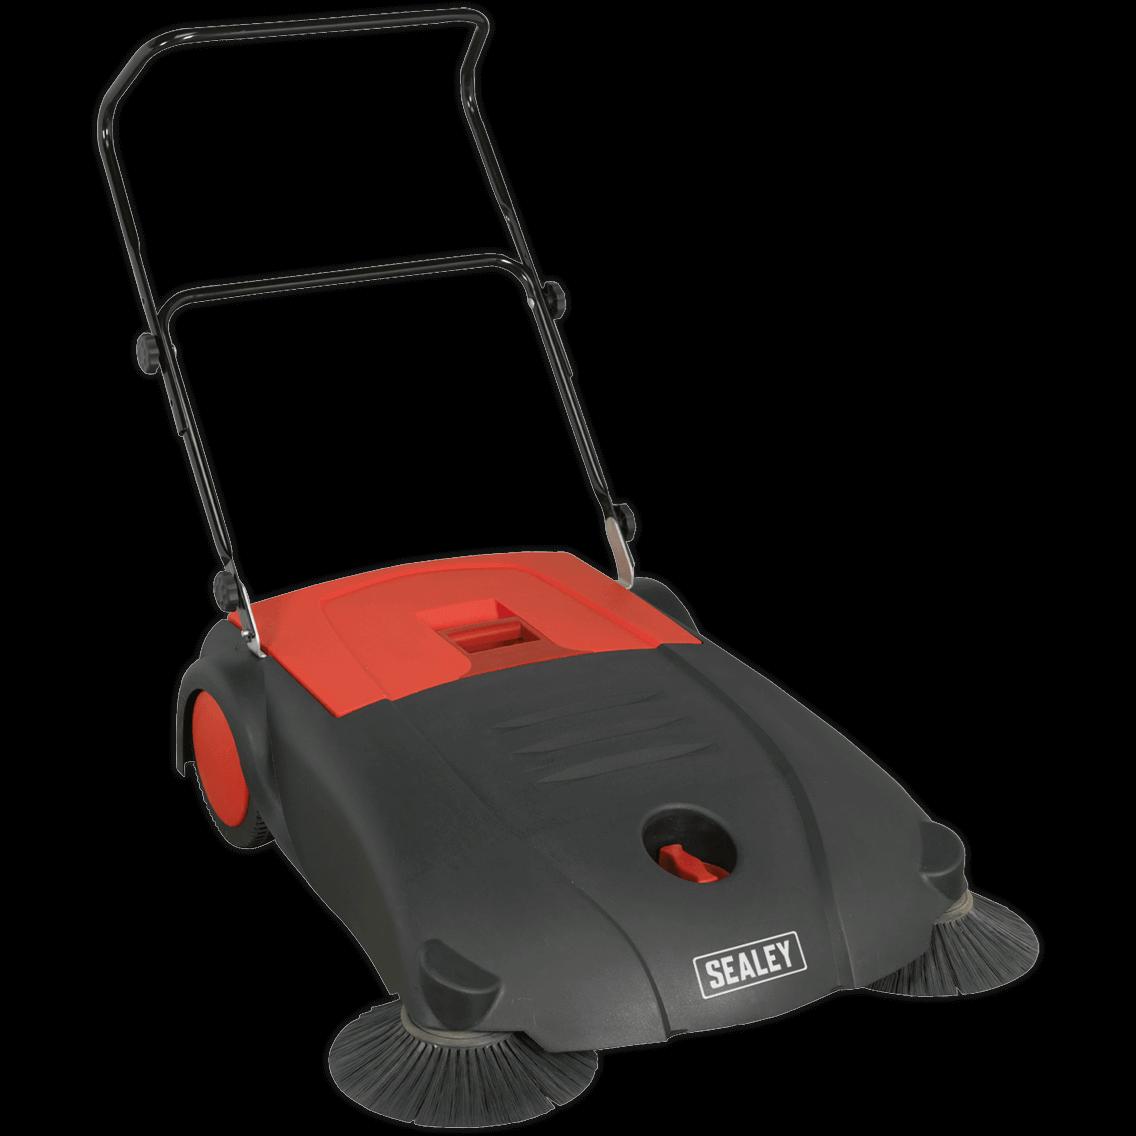 Sealey Fsw80 Floor Sweeper Sweepers